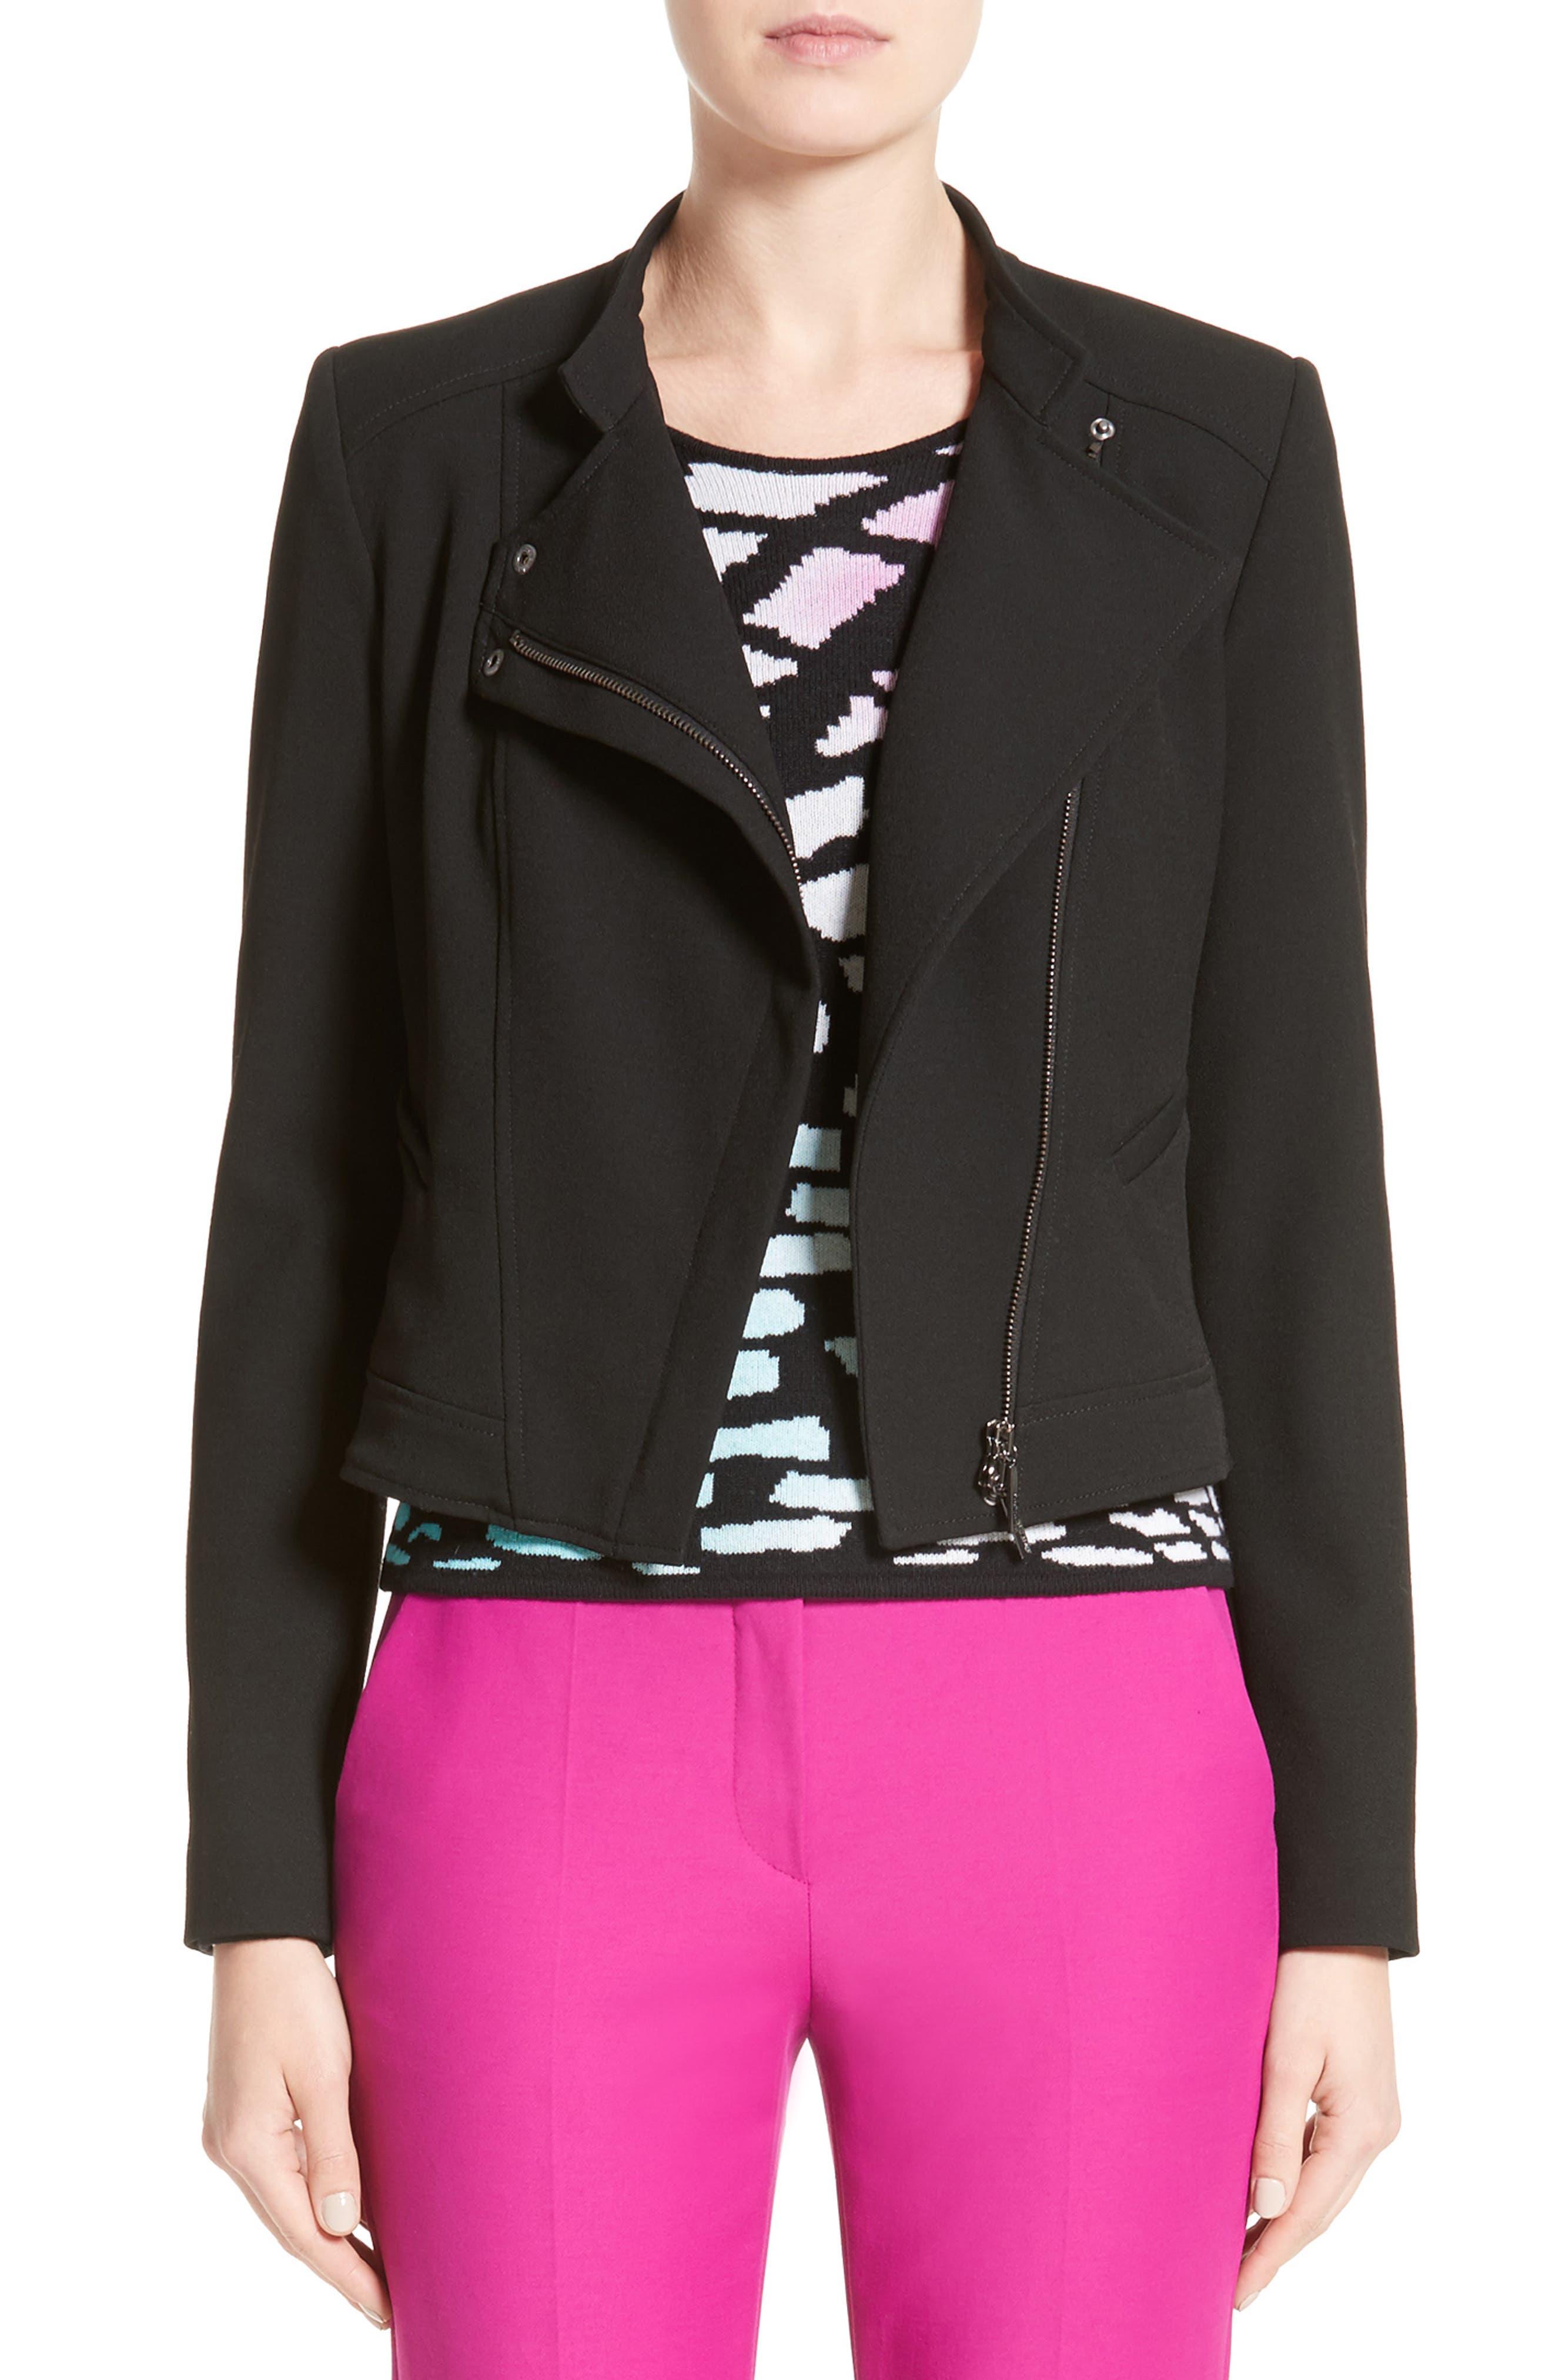 Armani Jeans Crepe Moto Jacket,                         Main,                         color, 001